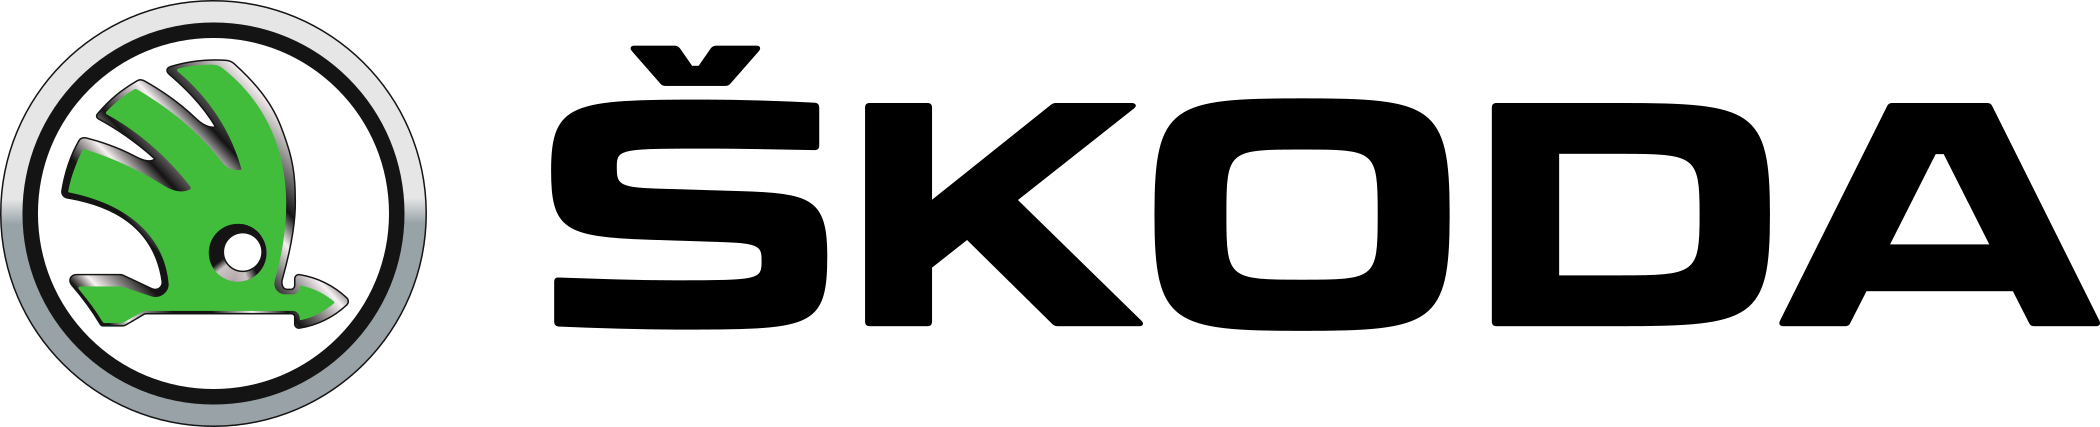 skoda-auto-logo-2